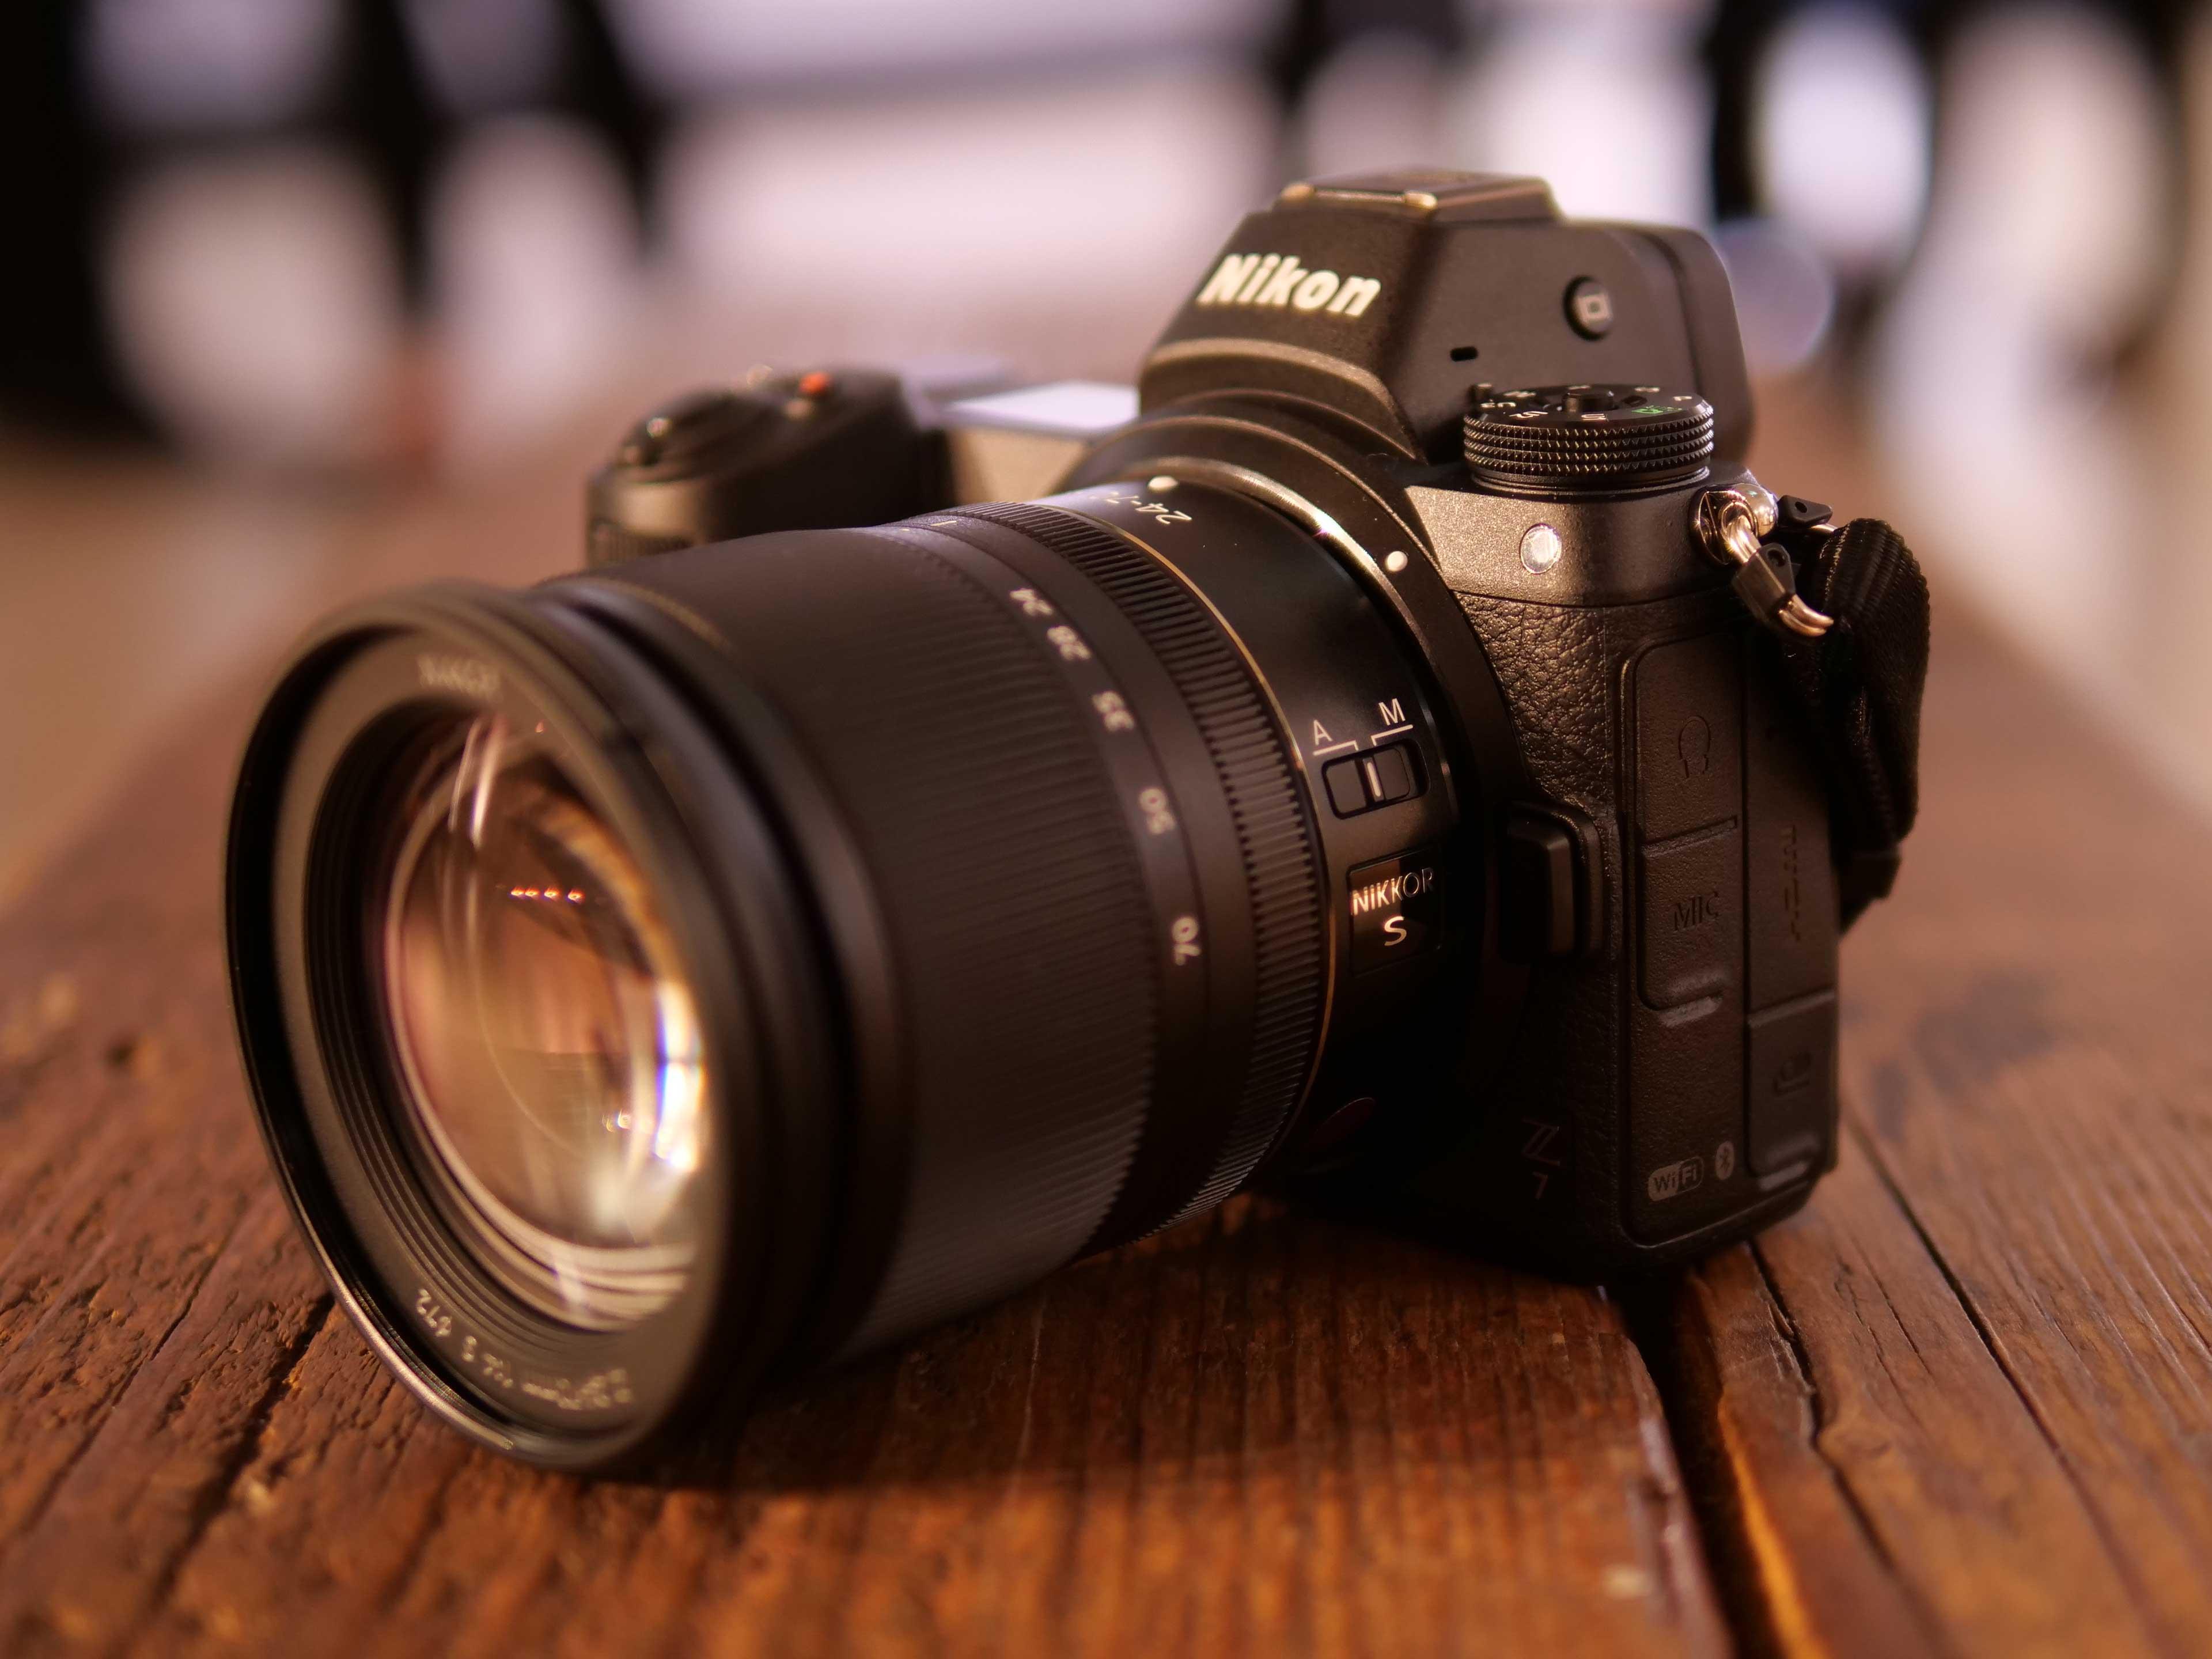 Nikon Z6 Review So Far Cameralabs